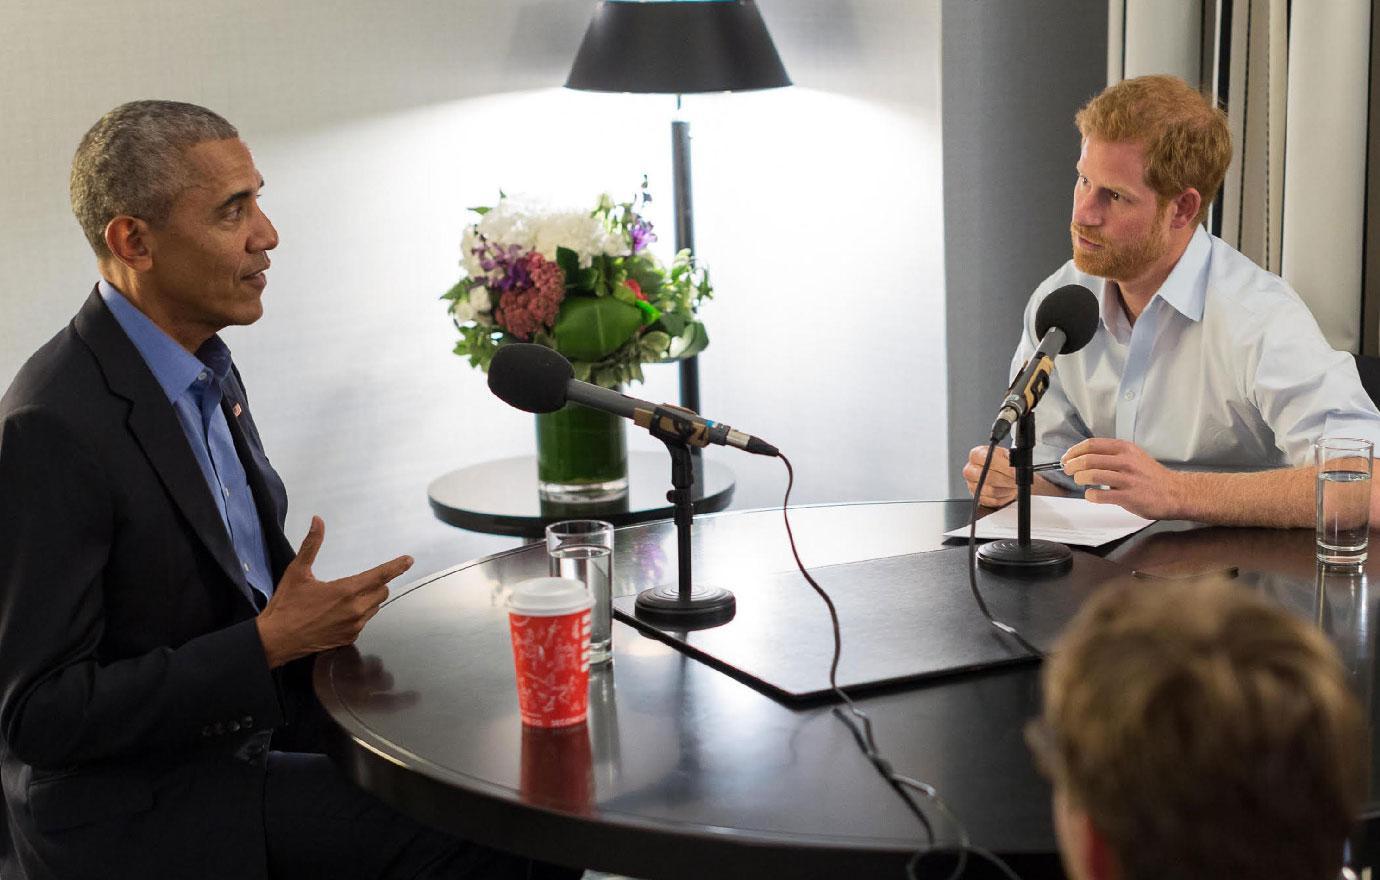 Prince Harry Interviews Friend Barack Obama